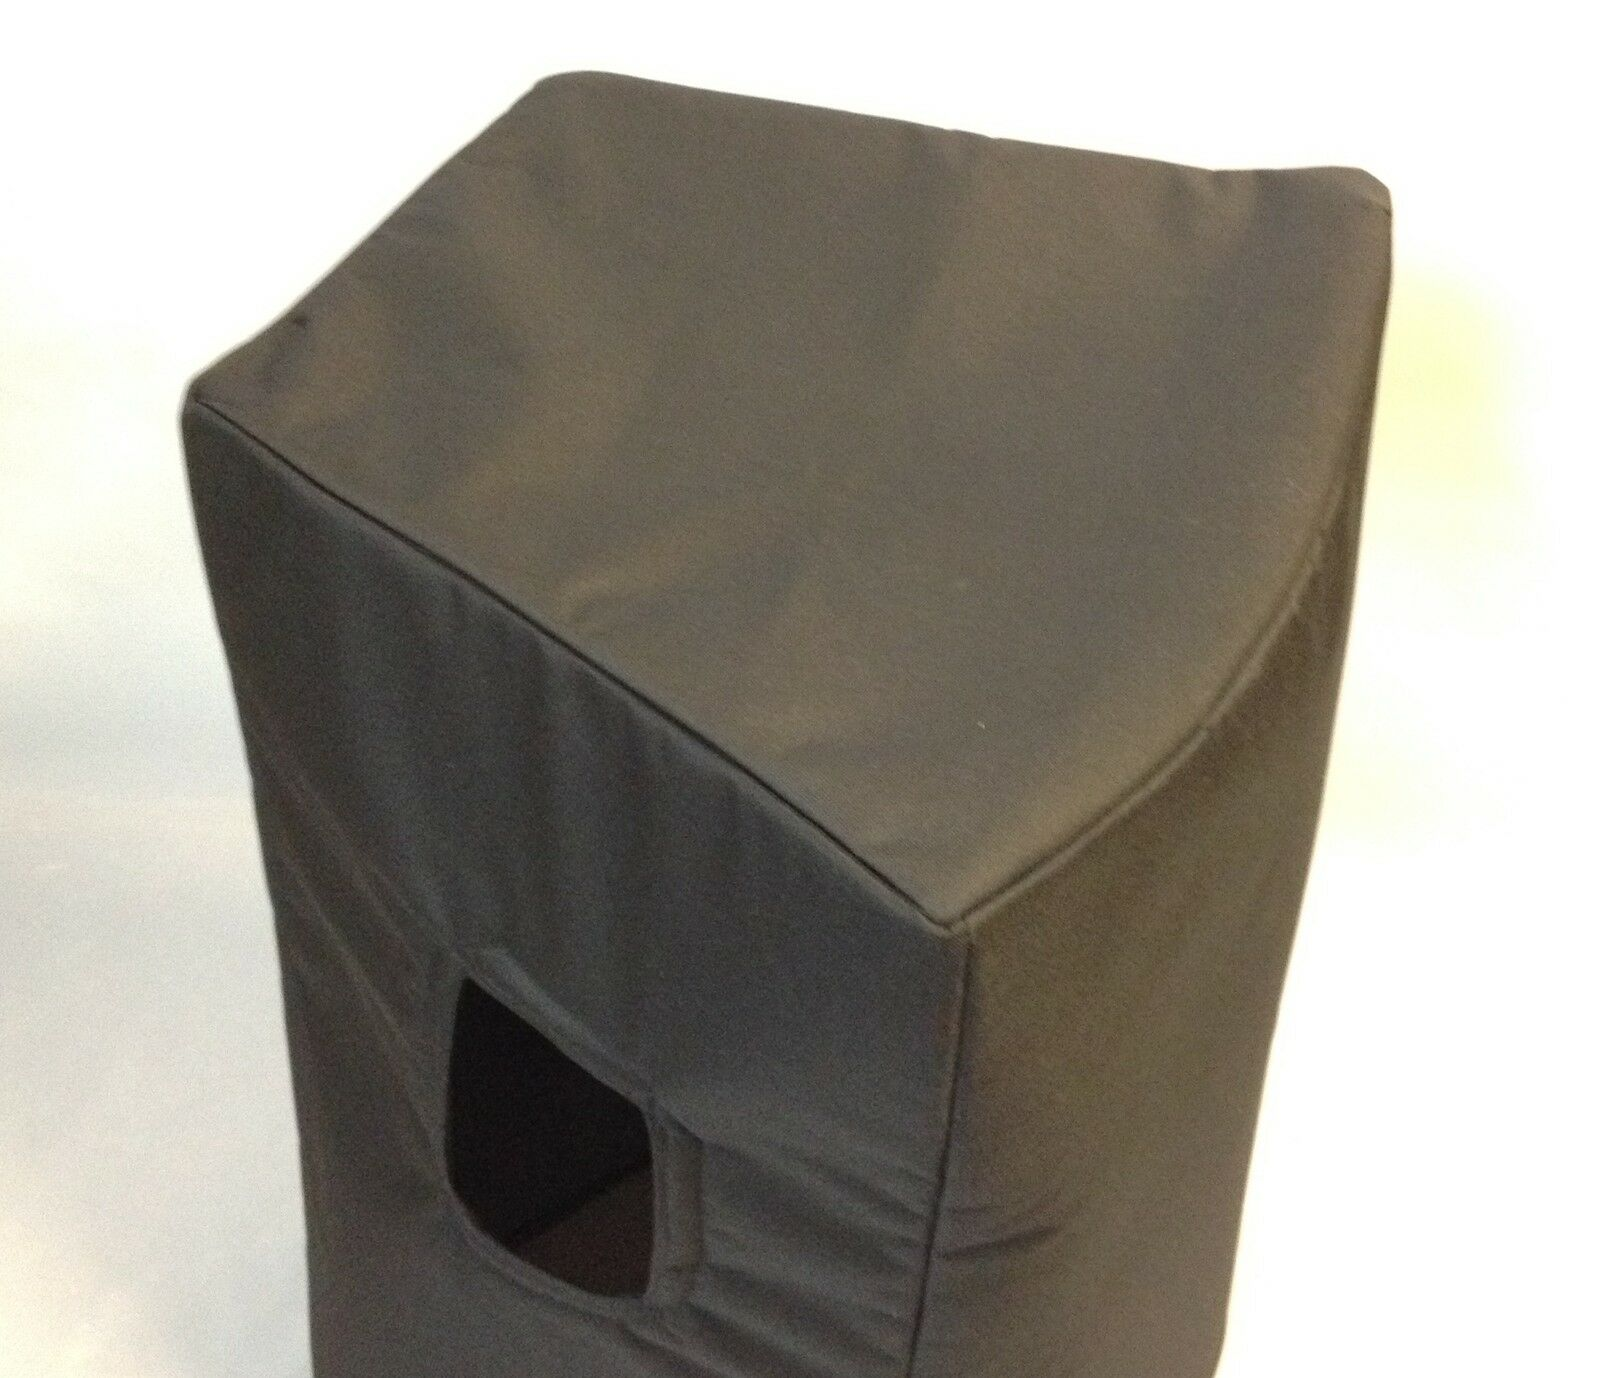 Yamaha DSR 115 Padded Speaker Covers (PAIR)